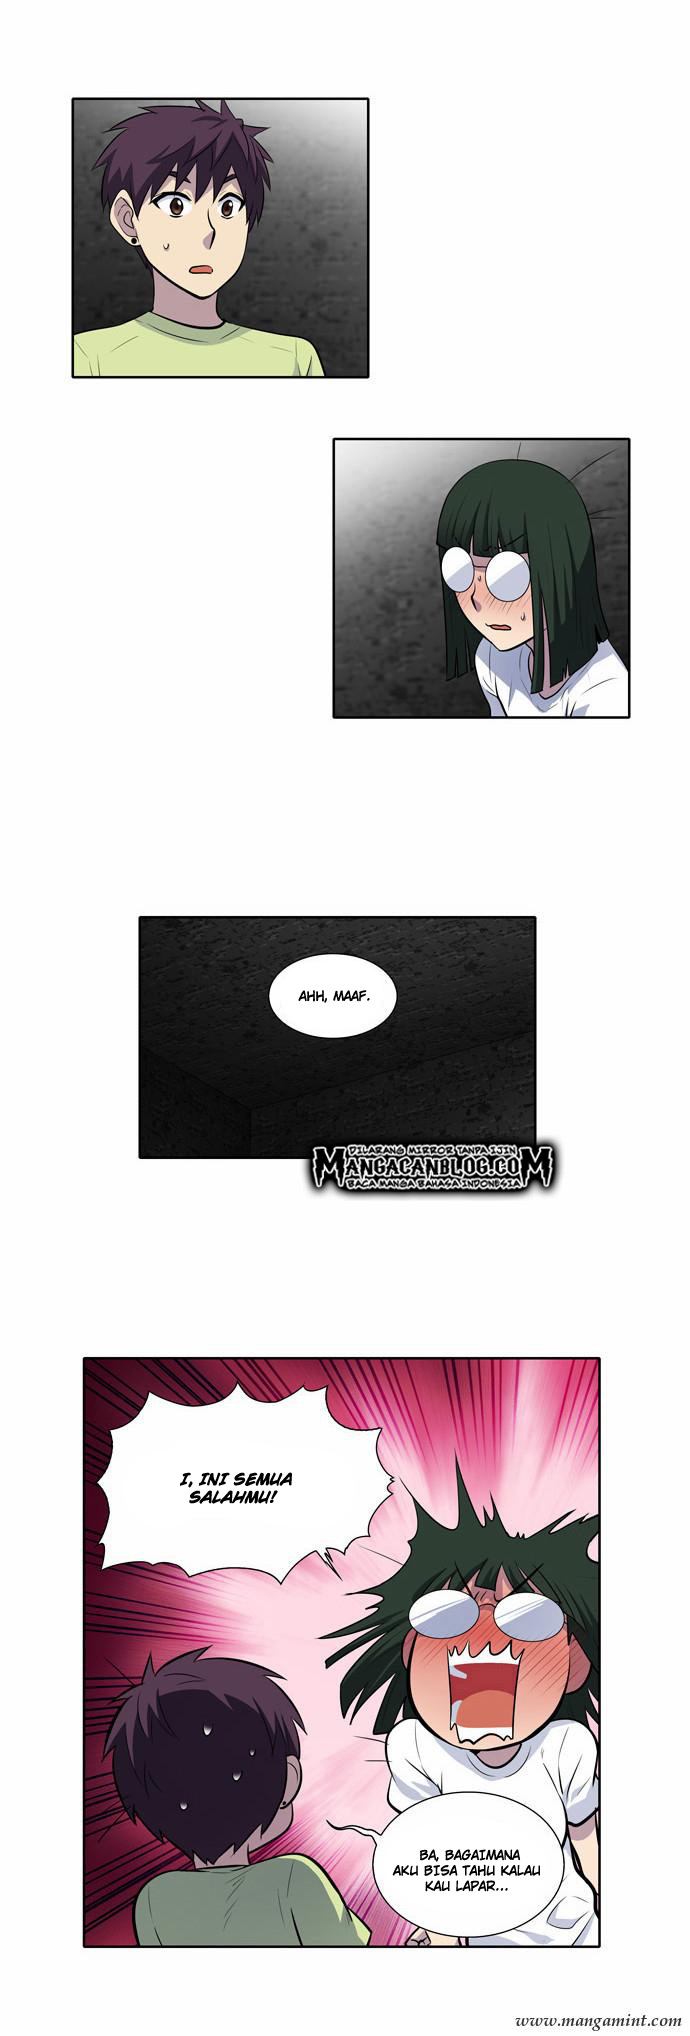 Dilarang COPAS - situs resmi www.mangacanblog.com - Komik the gamer 111 - bagaimana kau tidur dengan level itu? 112 Indonesia the gamer 111 - bagaimana kau tidur dengan level itu? Terbaru 3|Baca Manga Komik Indonesia|Mangacan